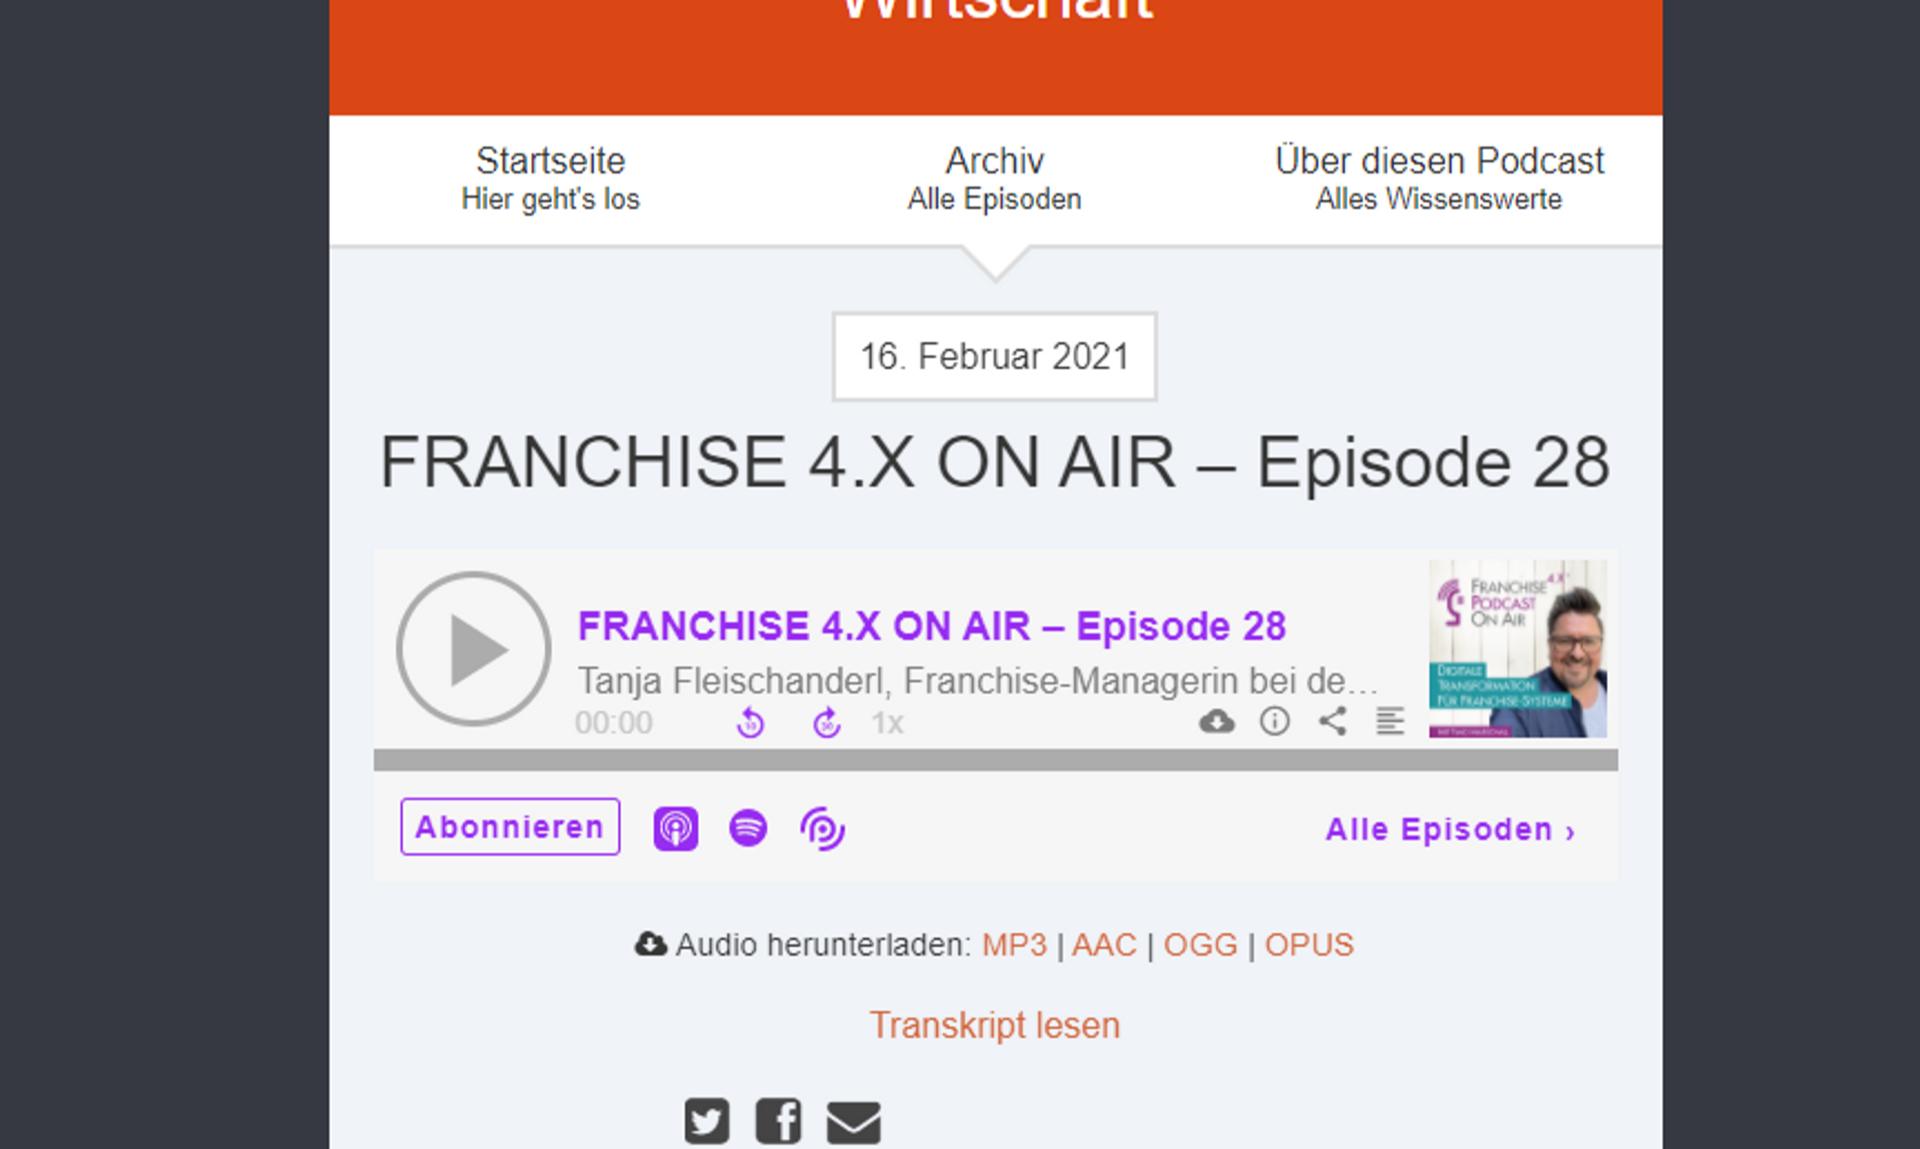 Podcast: Biogena zu Gast bei Franchise 4.X